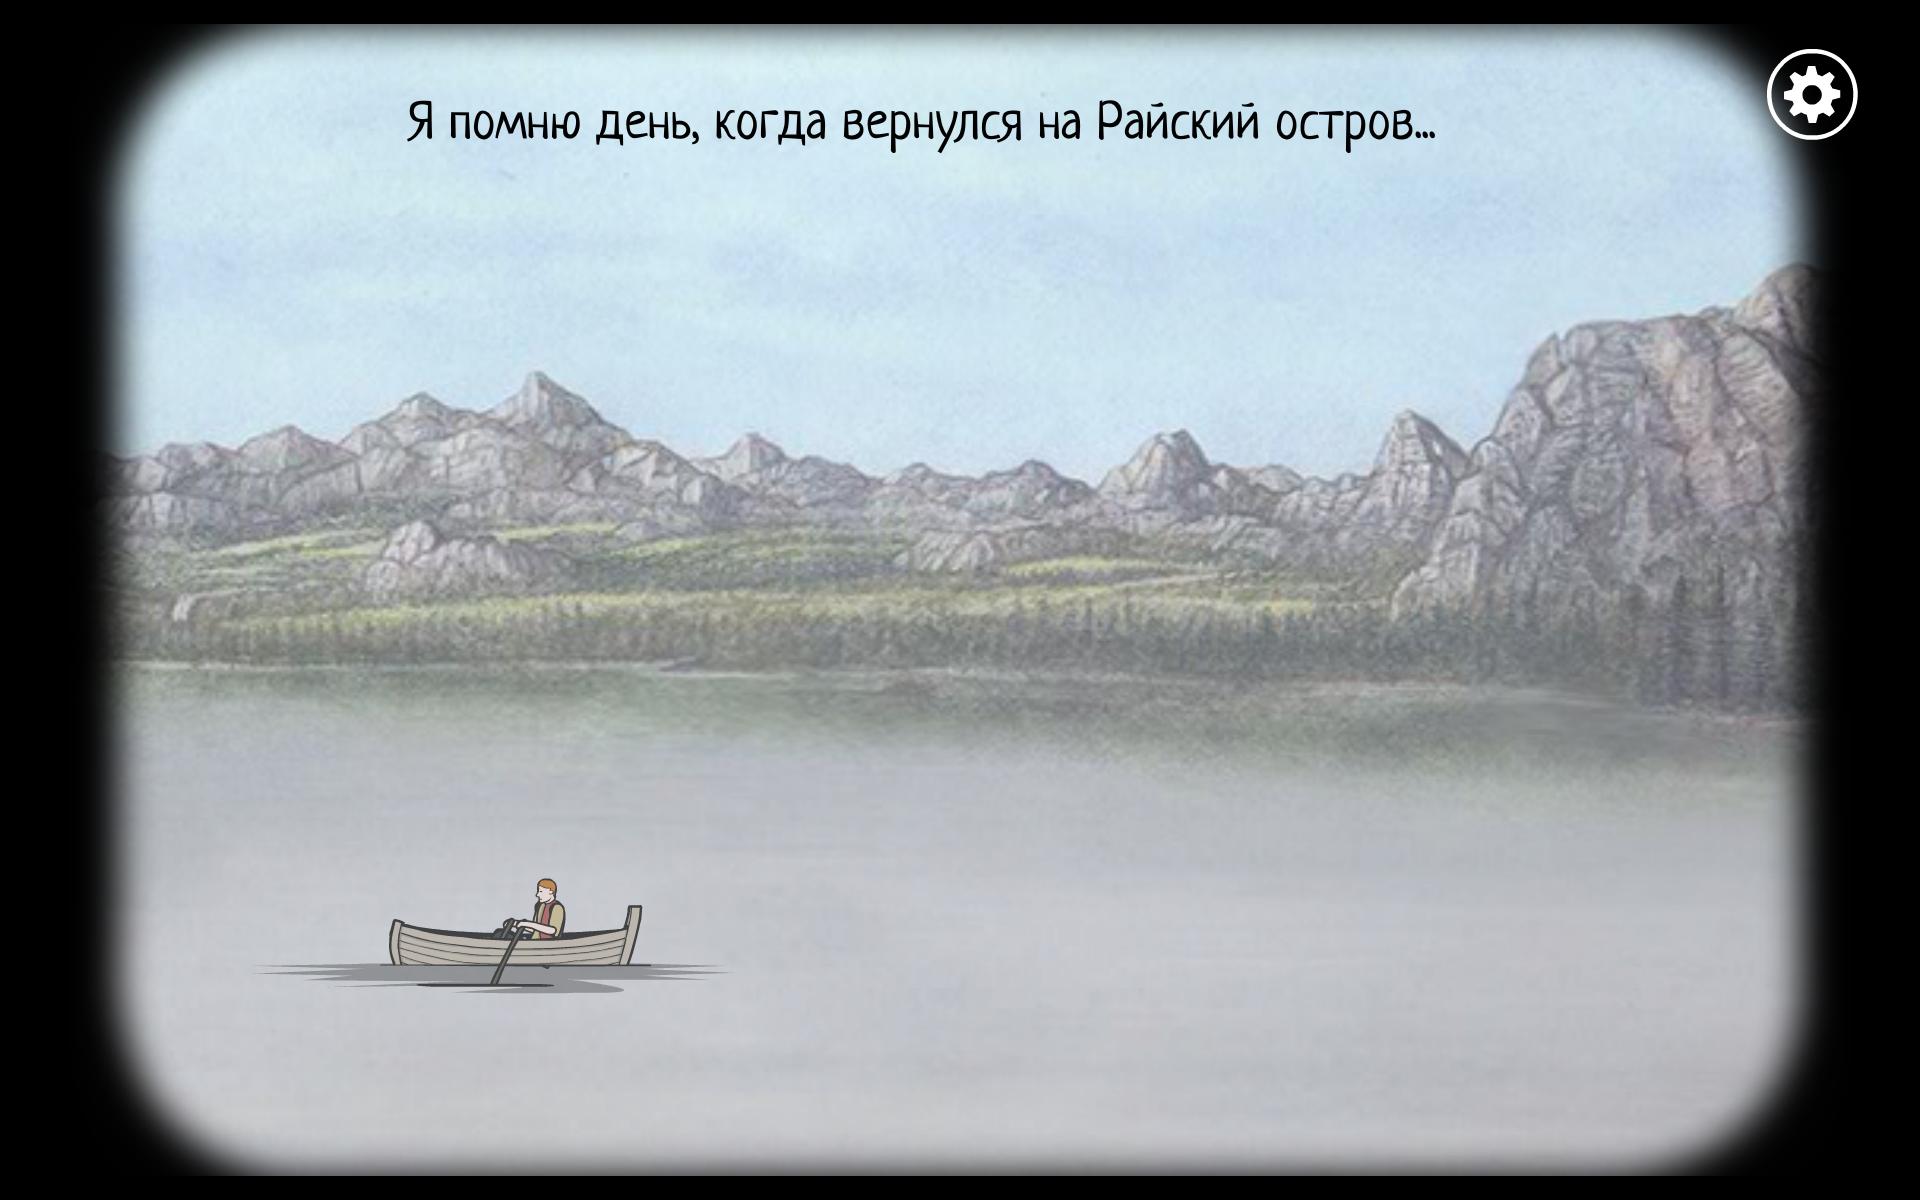 http://i4.imageban.ru/out/2018/01/13/0c63d1864b640f6aa2280b7bac6fb7bc.png